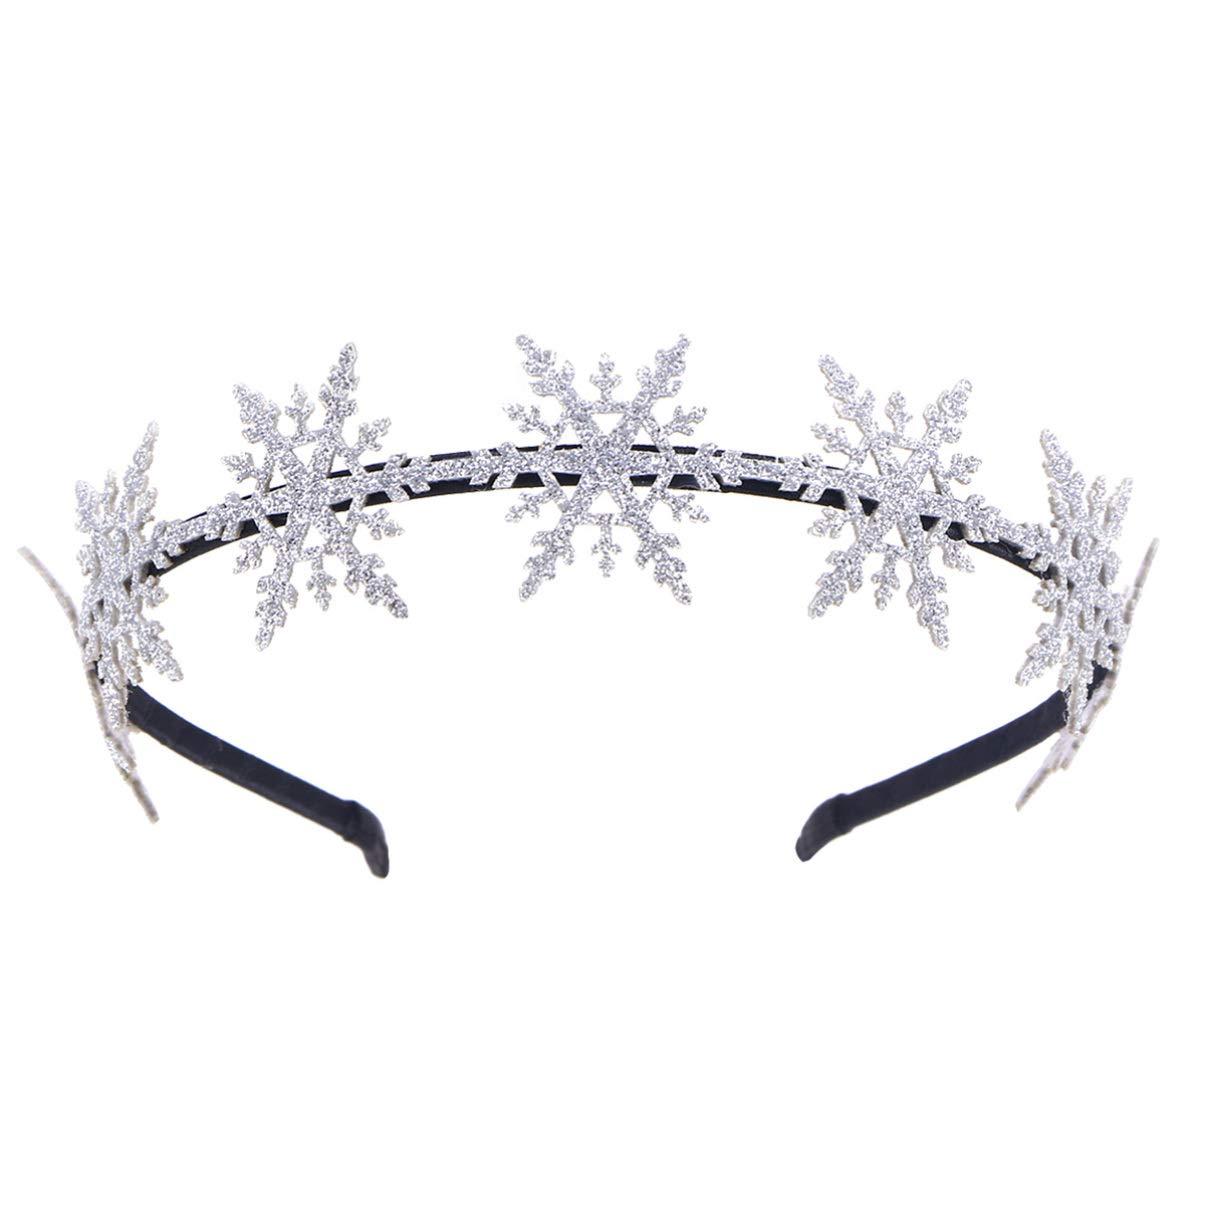 Lurrose Glitter Snowflake Headband Christmas Headband Christmas Hair Hoop for Costume Carnival Holiday Christmas Party Favor (Silver)